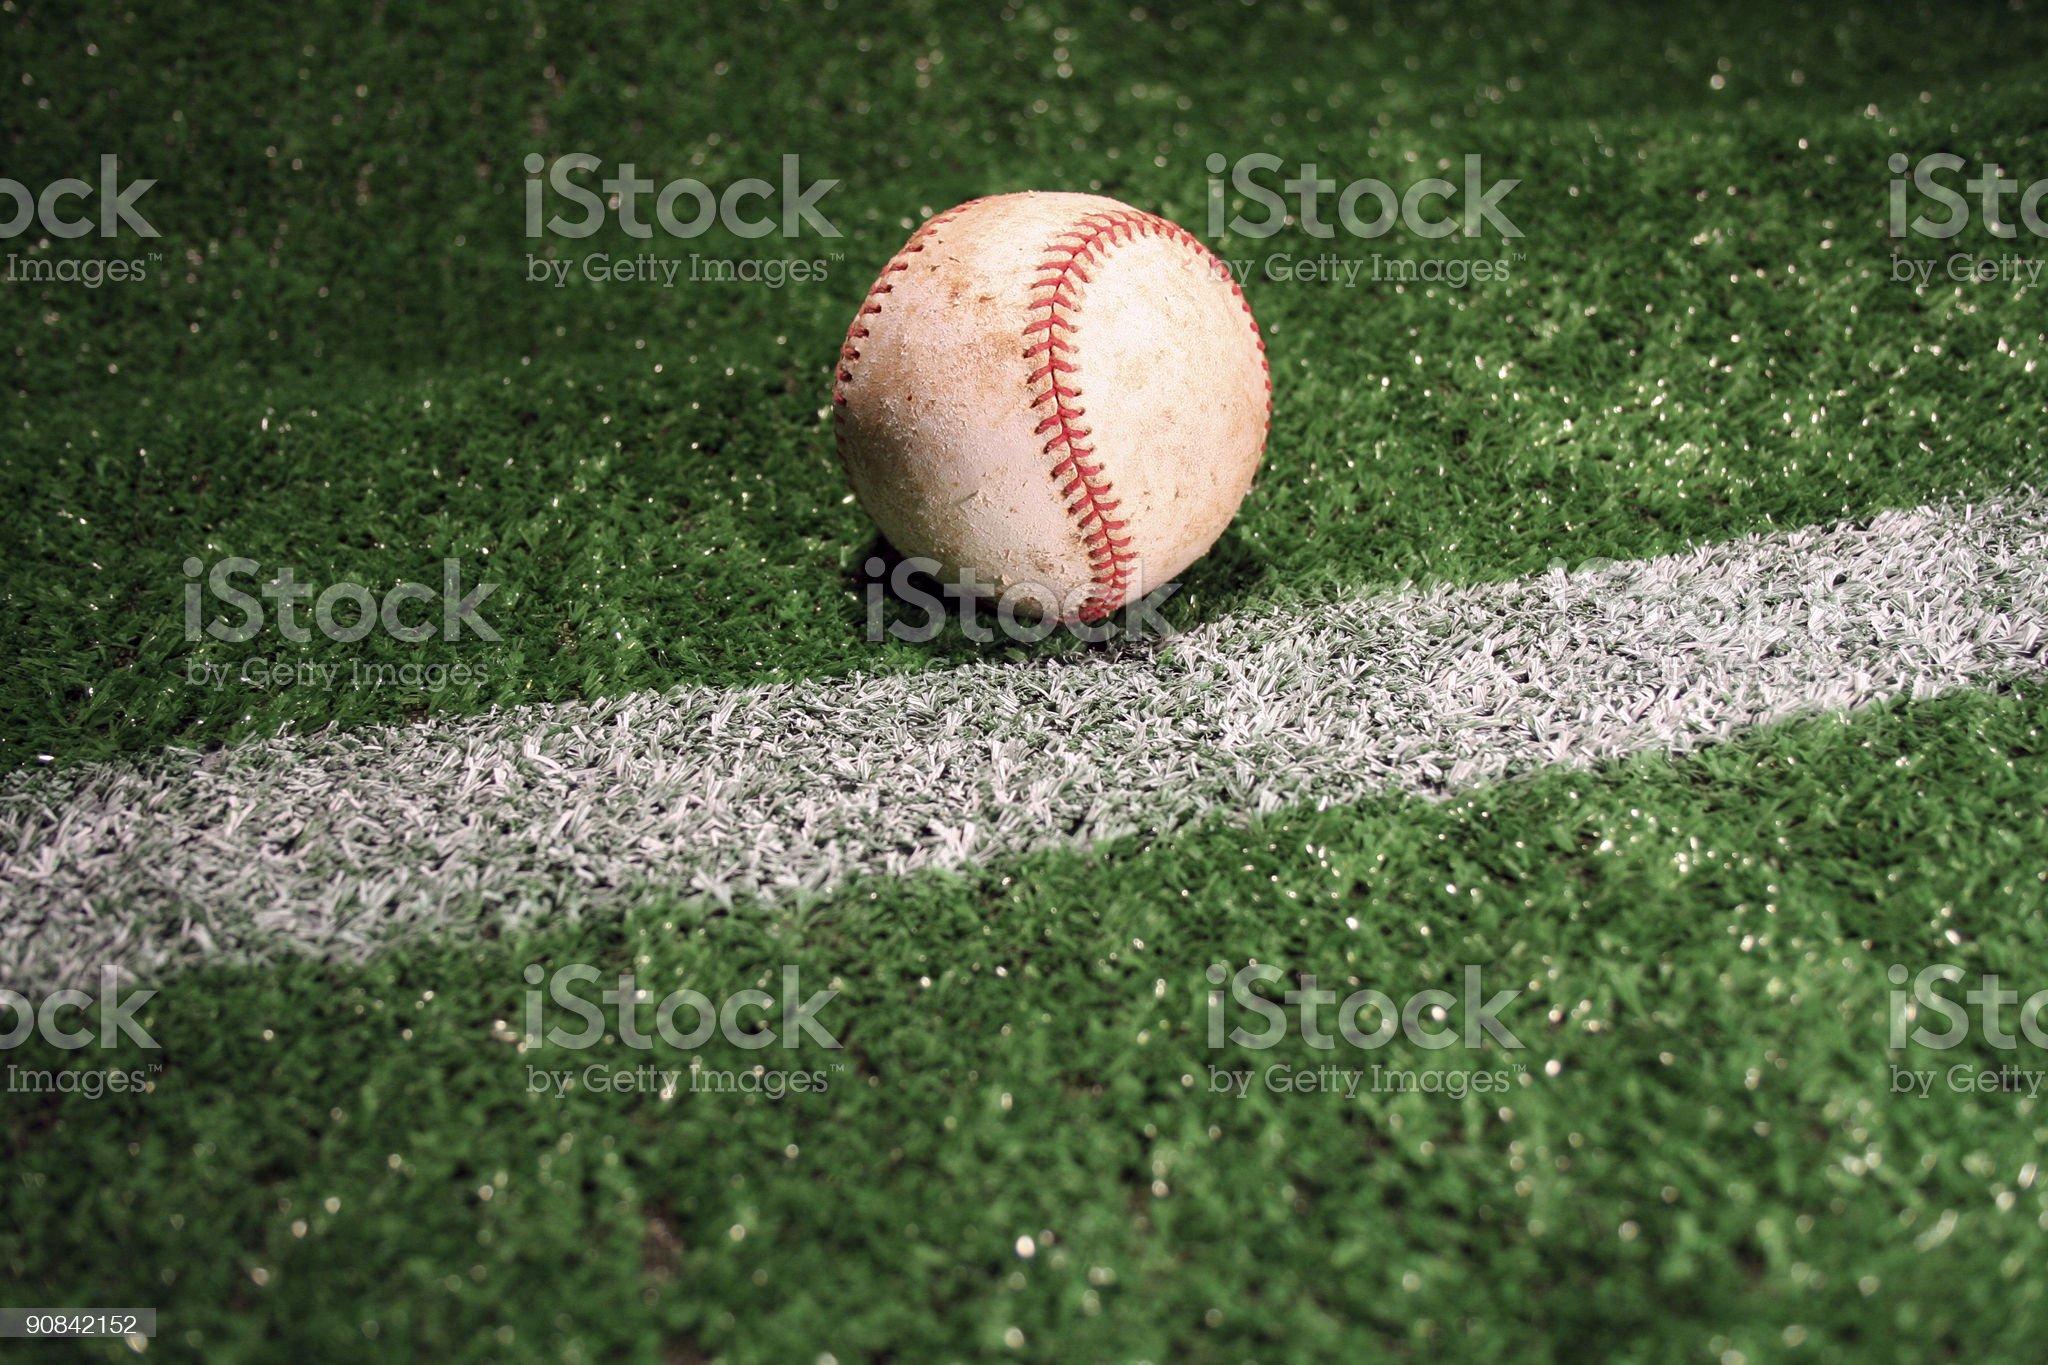 foul ball royalty-free stock photo